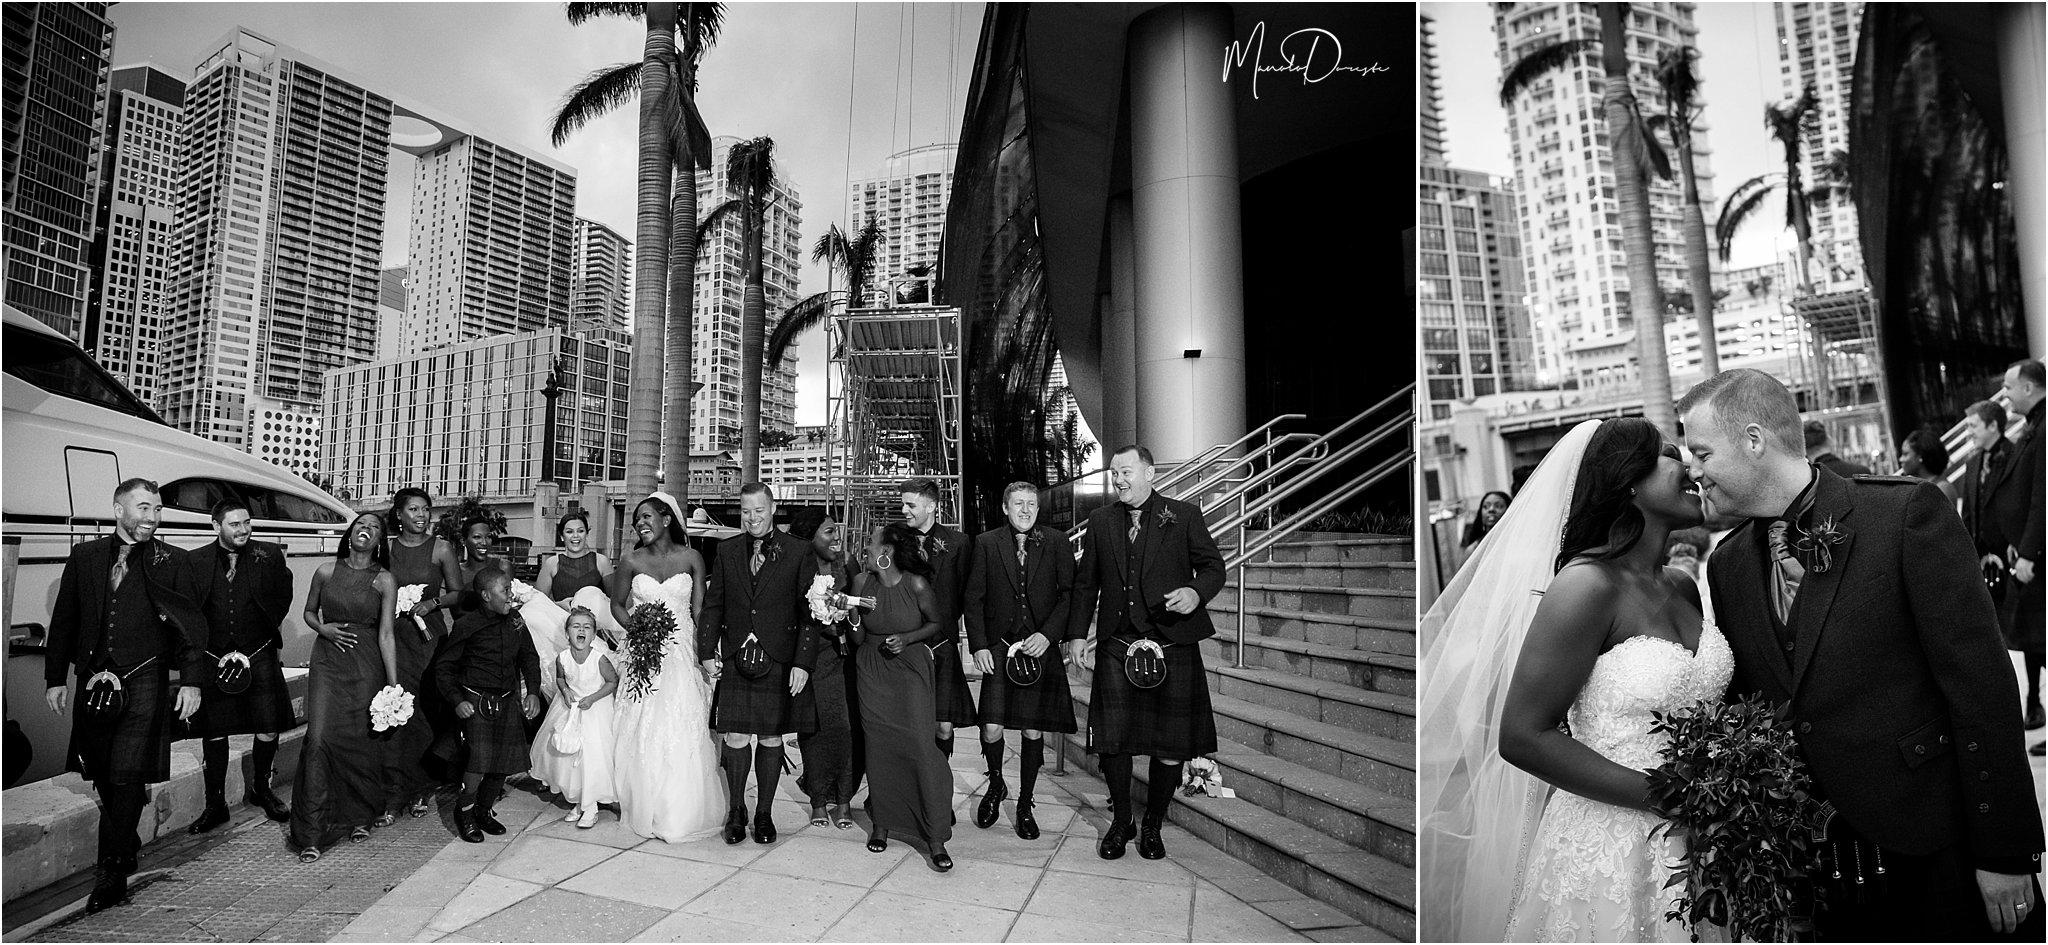 0122_ManoloDoreste_InFocusStudios_Wedding_Family_Photography_Miami_MiamiPhotographer.jpg